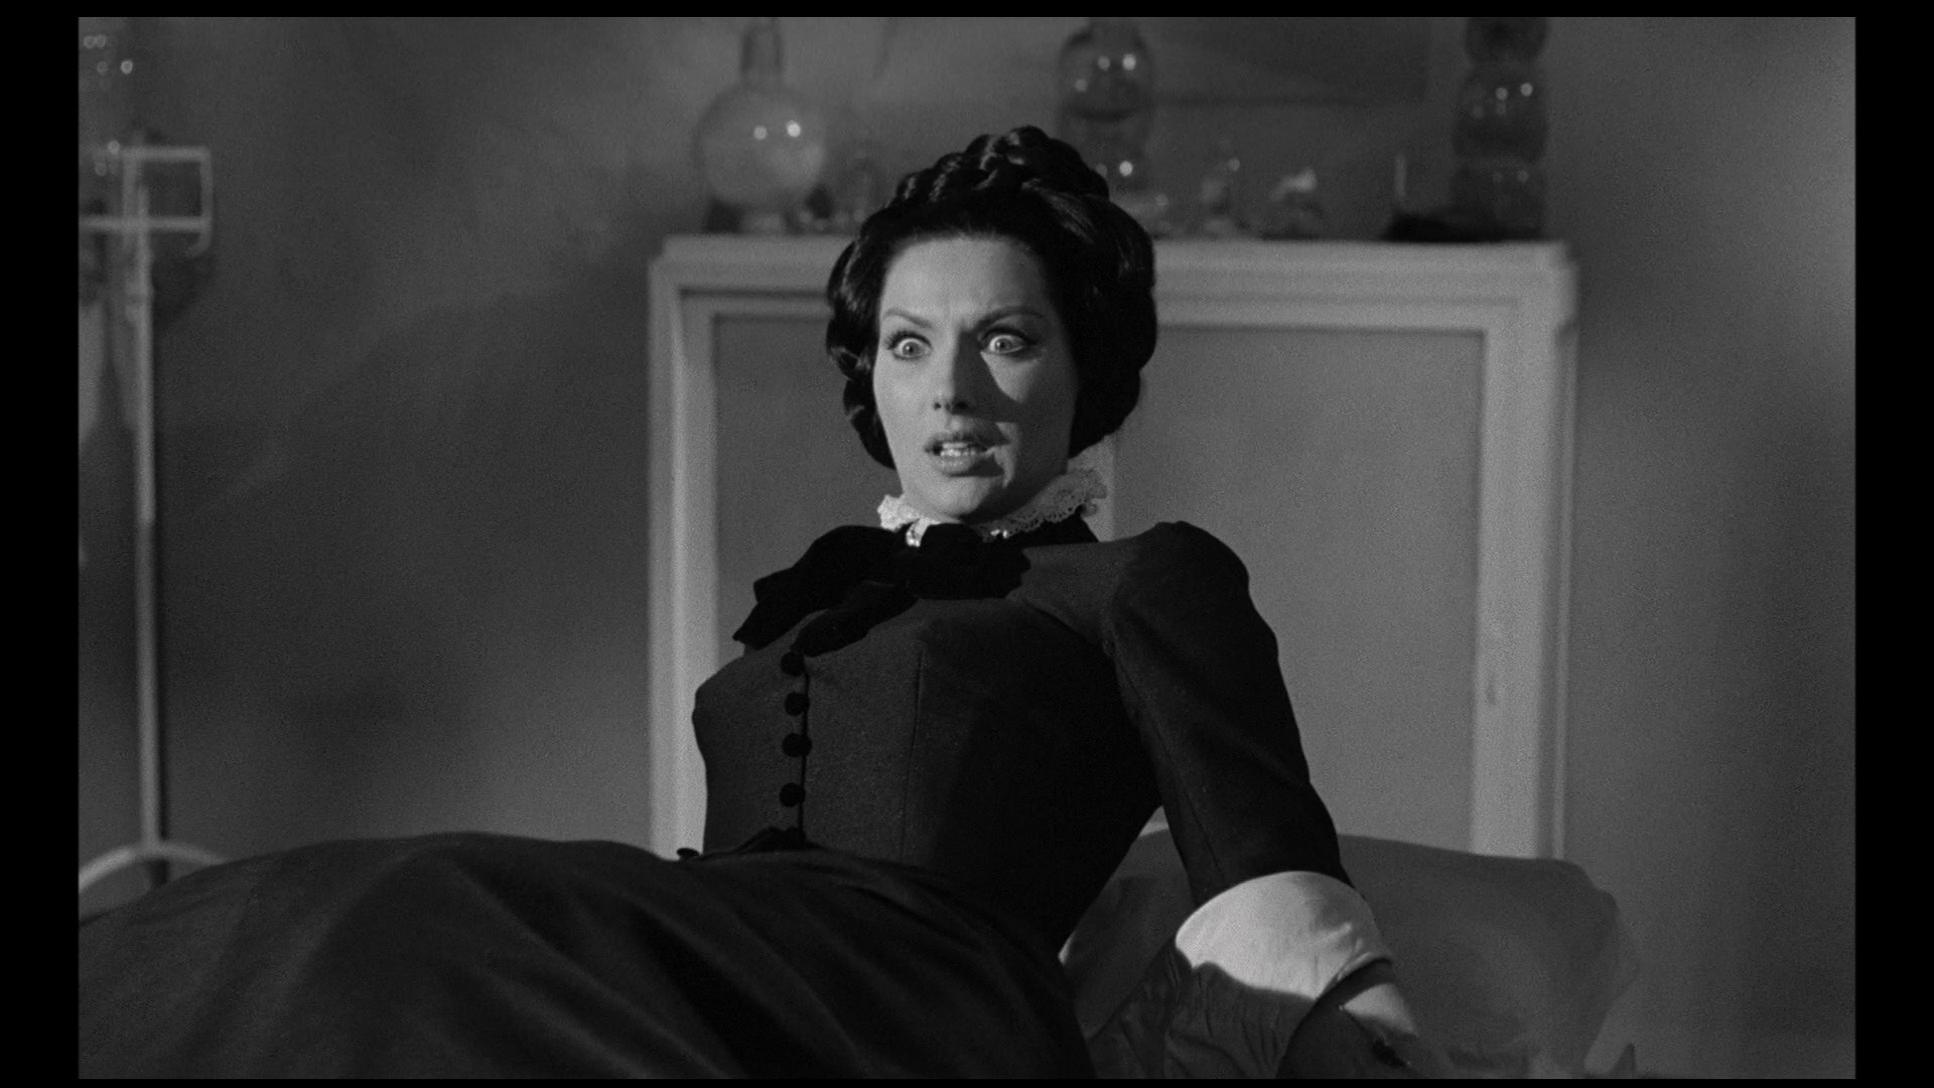 Helga Liné in Amanti d'oltretomba (1965)